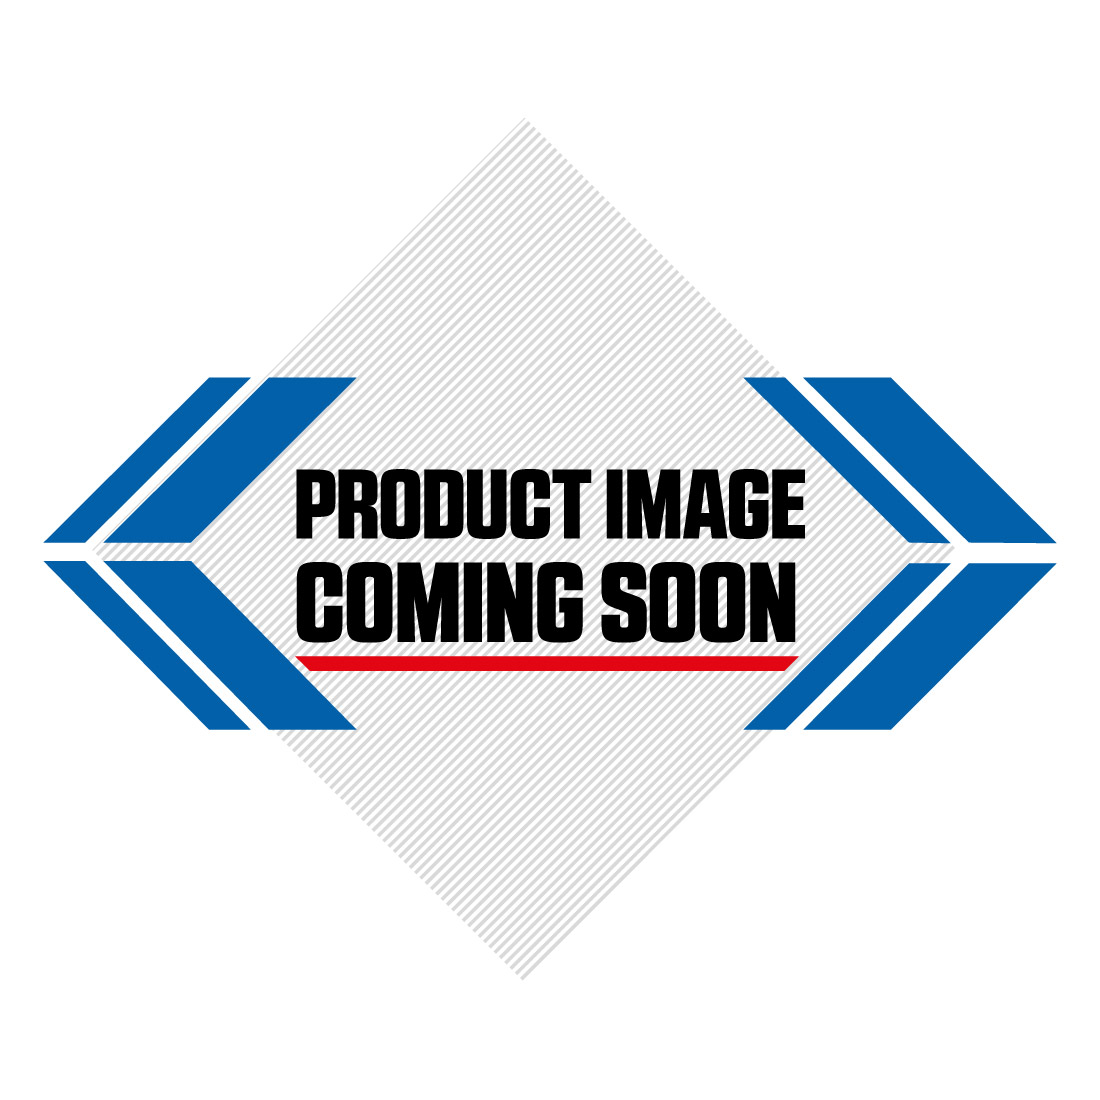 Suzuki Plastic Kit Suzuki RMZ 450 (08-17) White Image-2